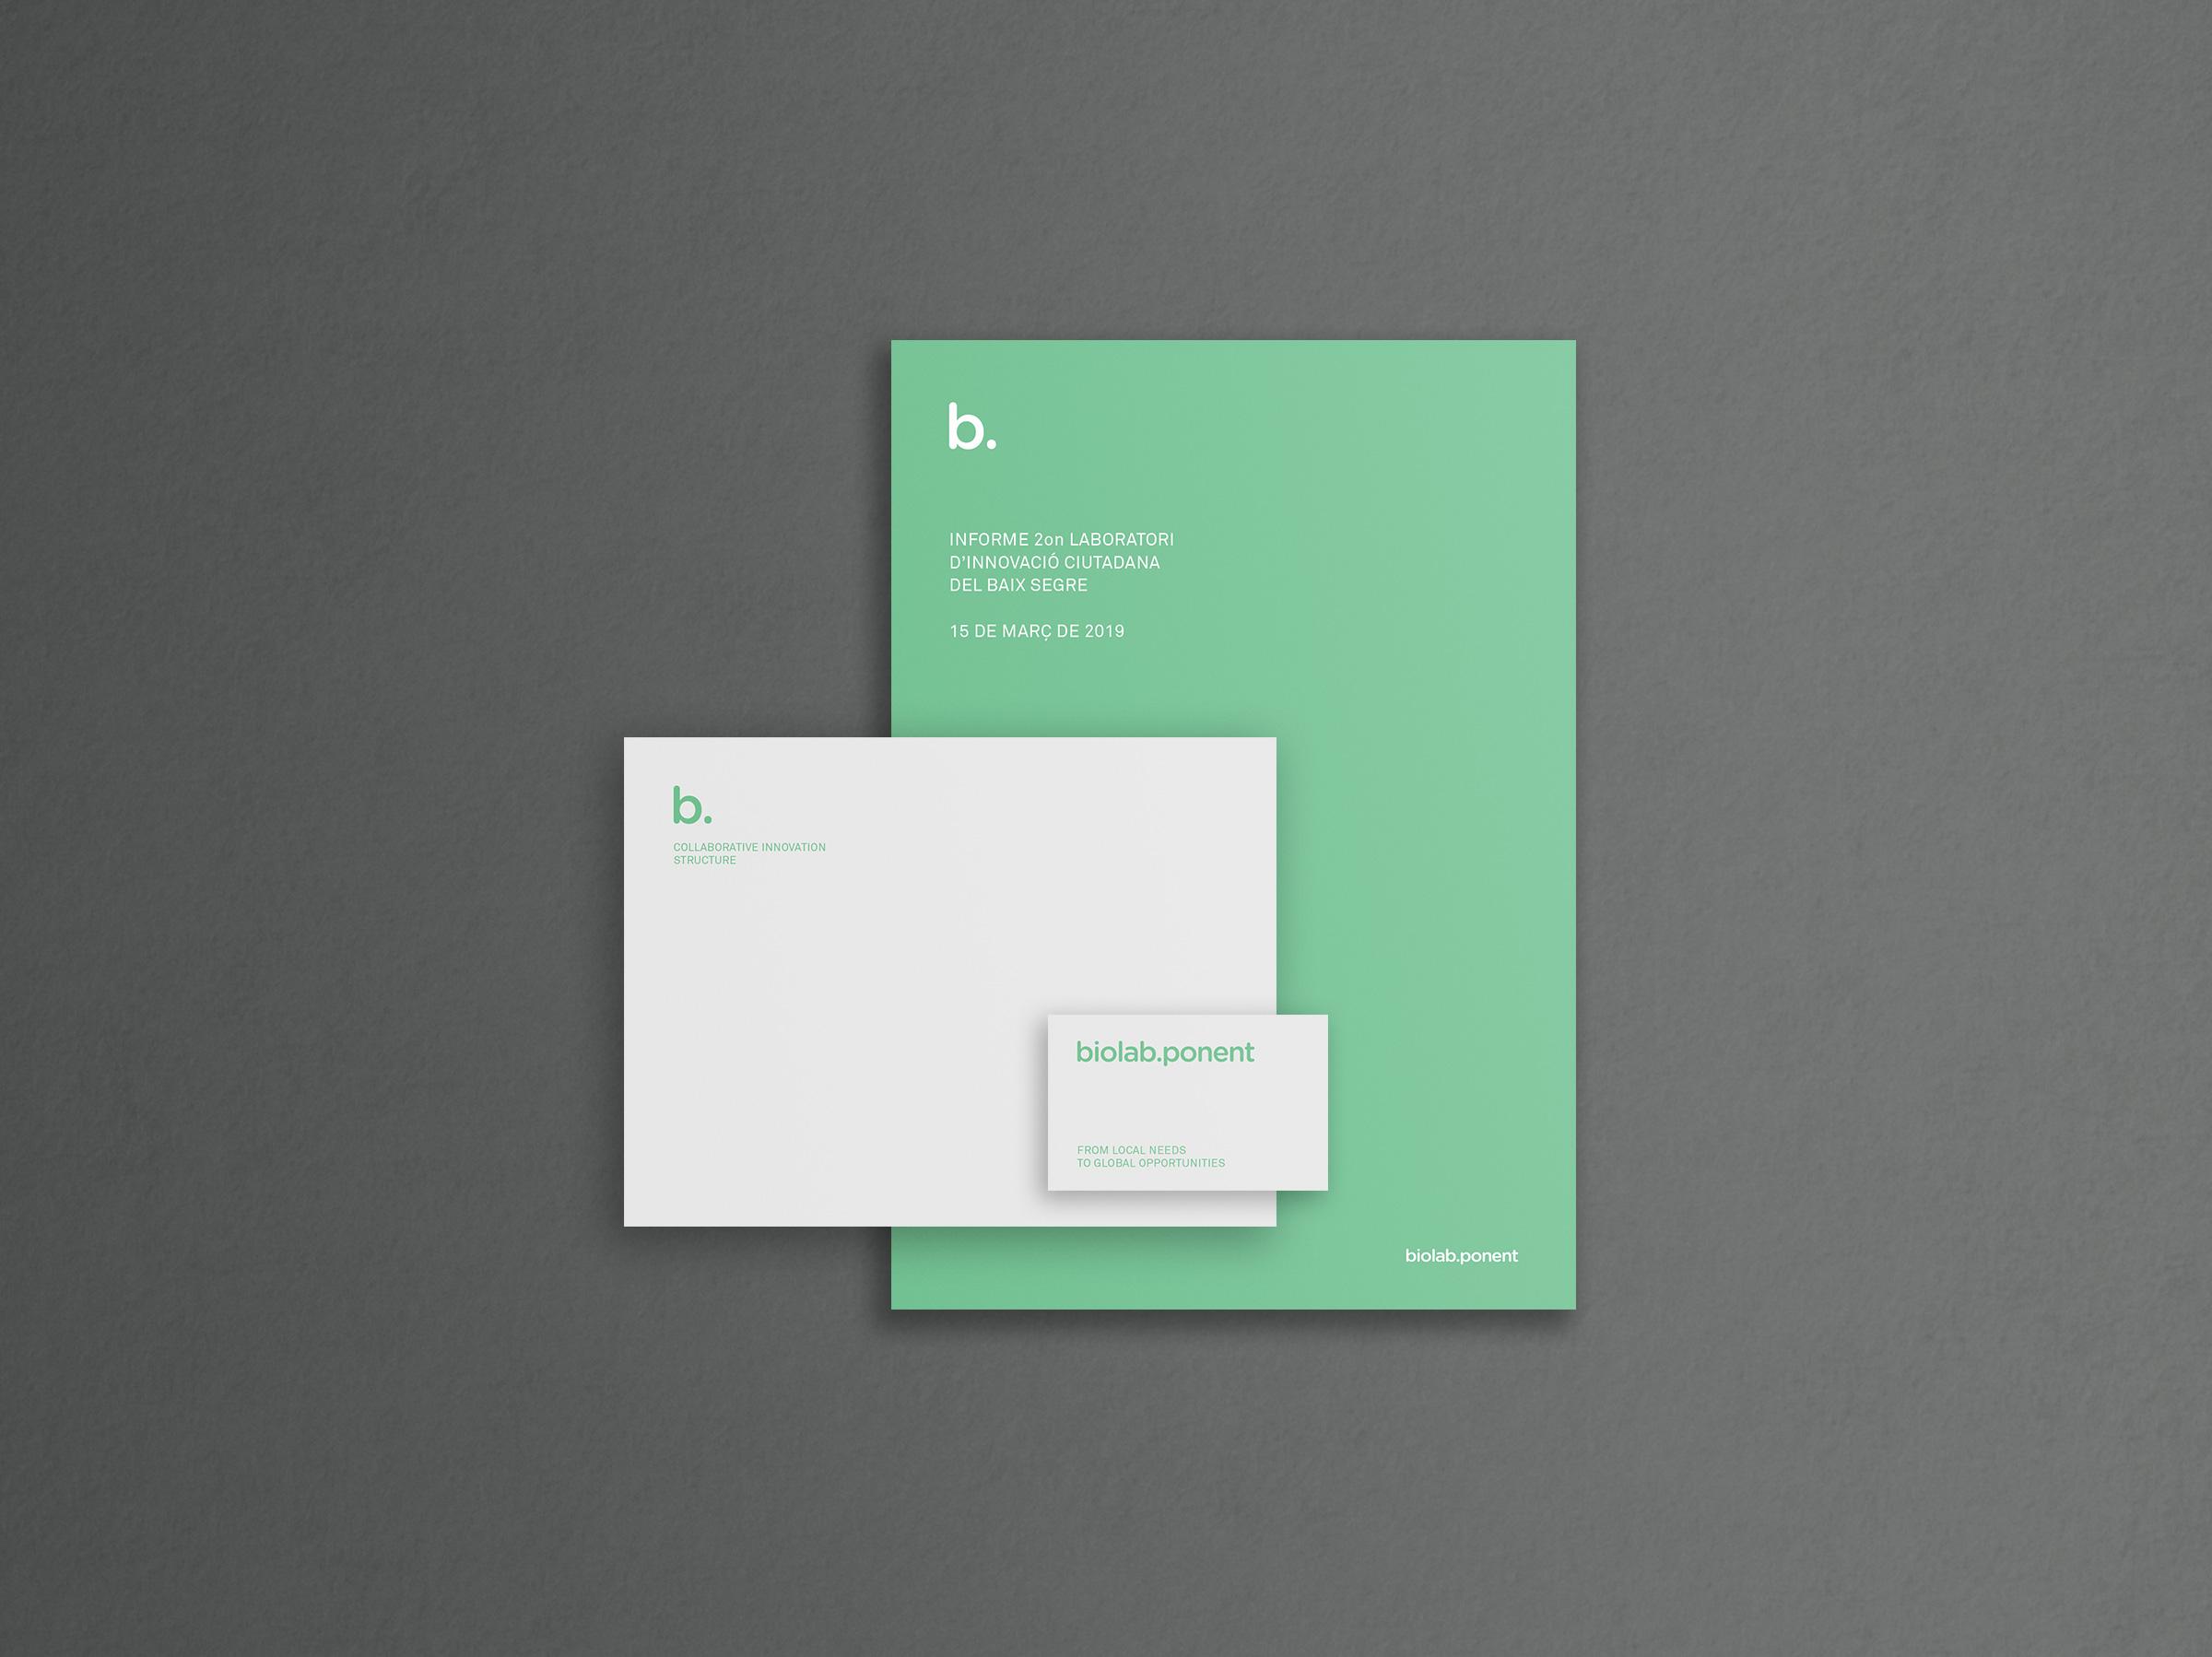 Biolab_Ponent-2019-branding-Latipo-2